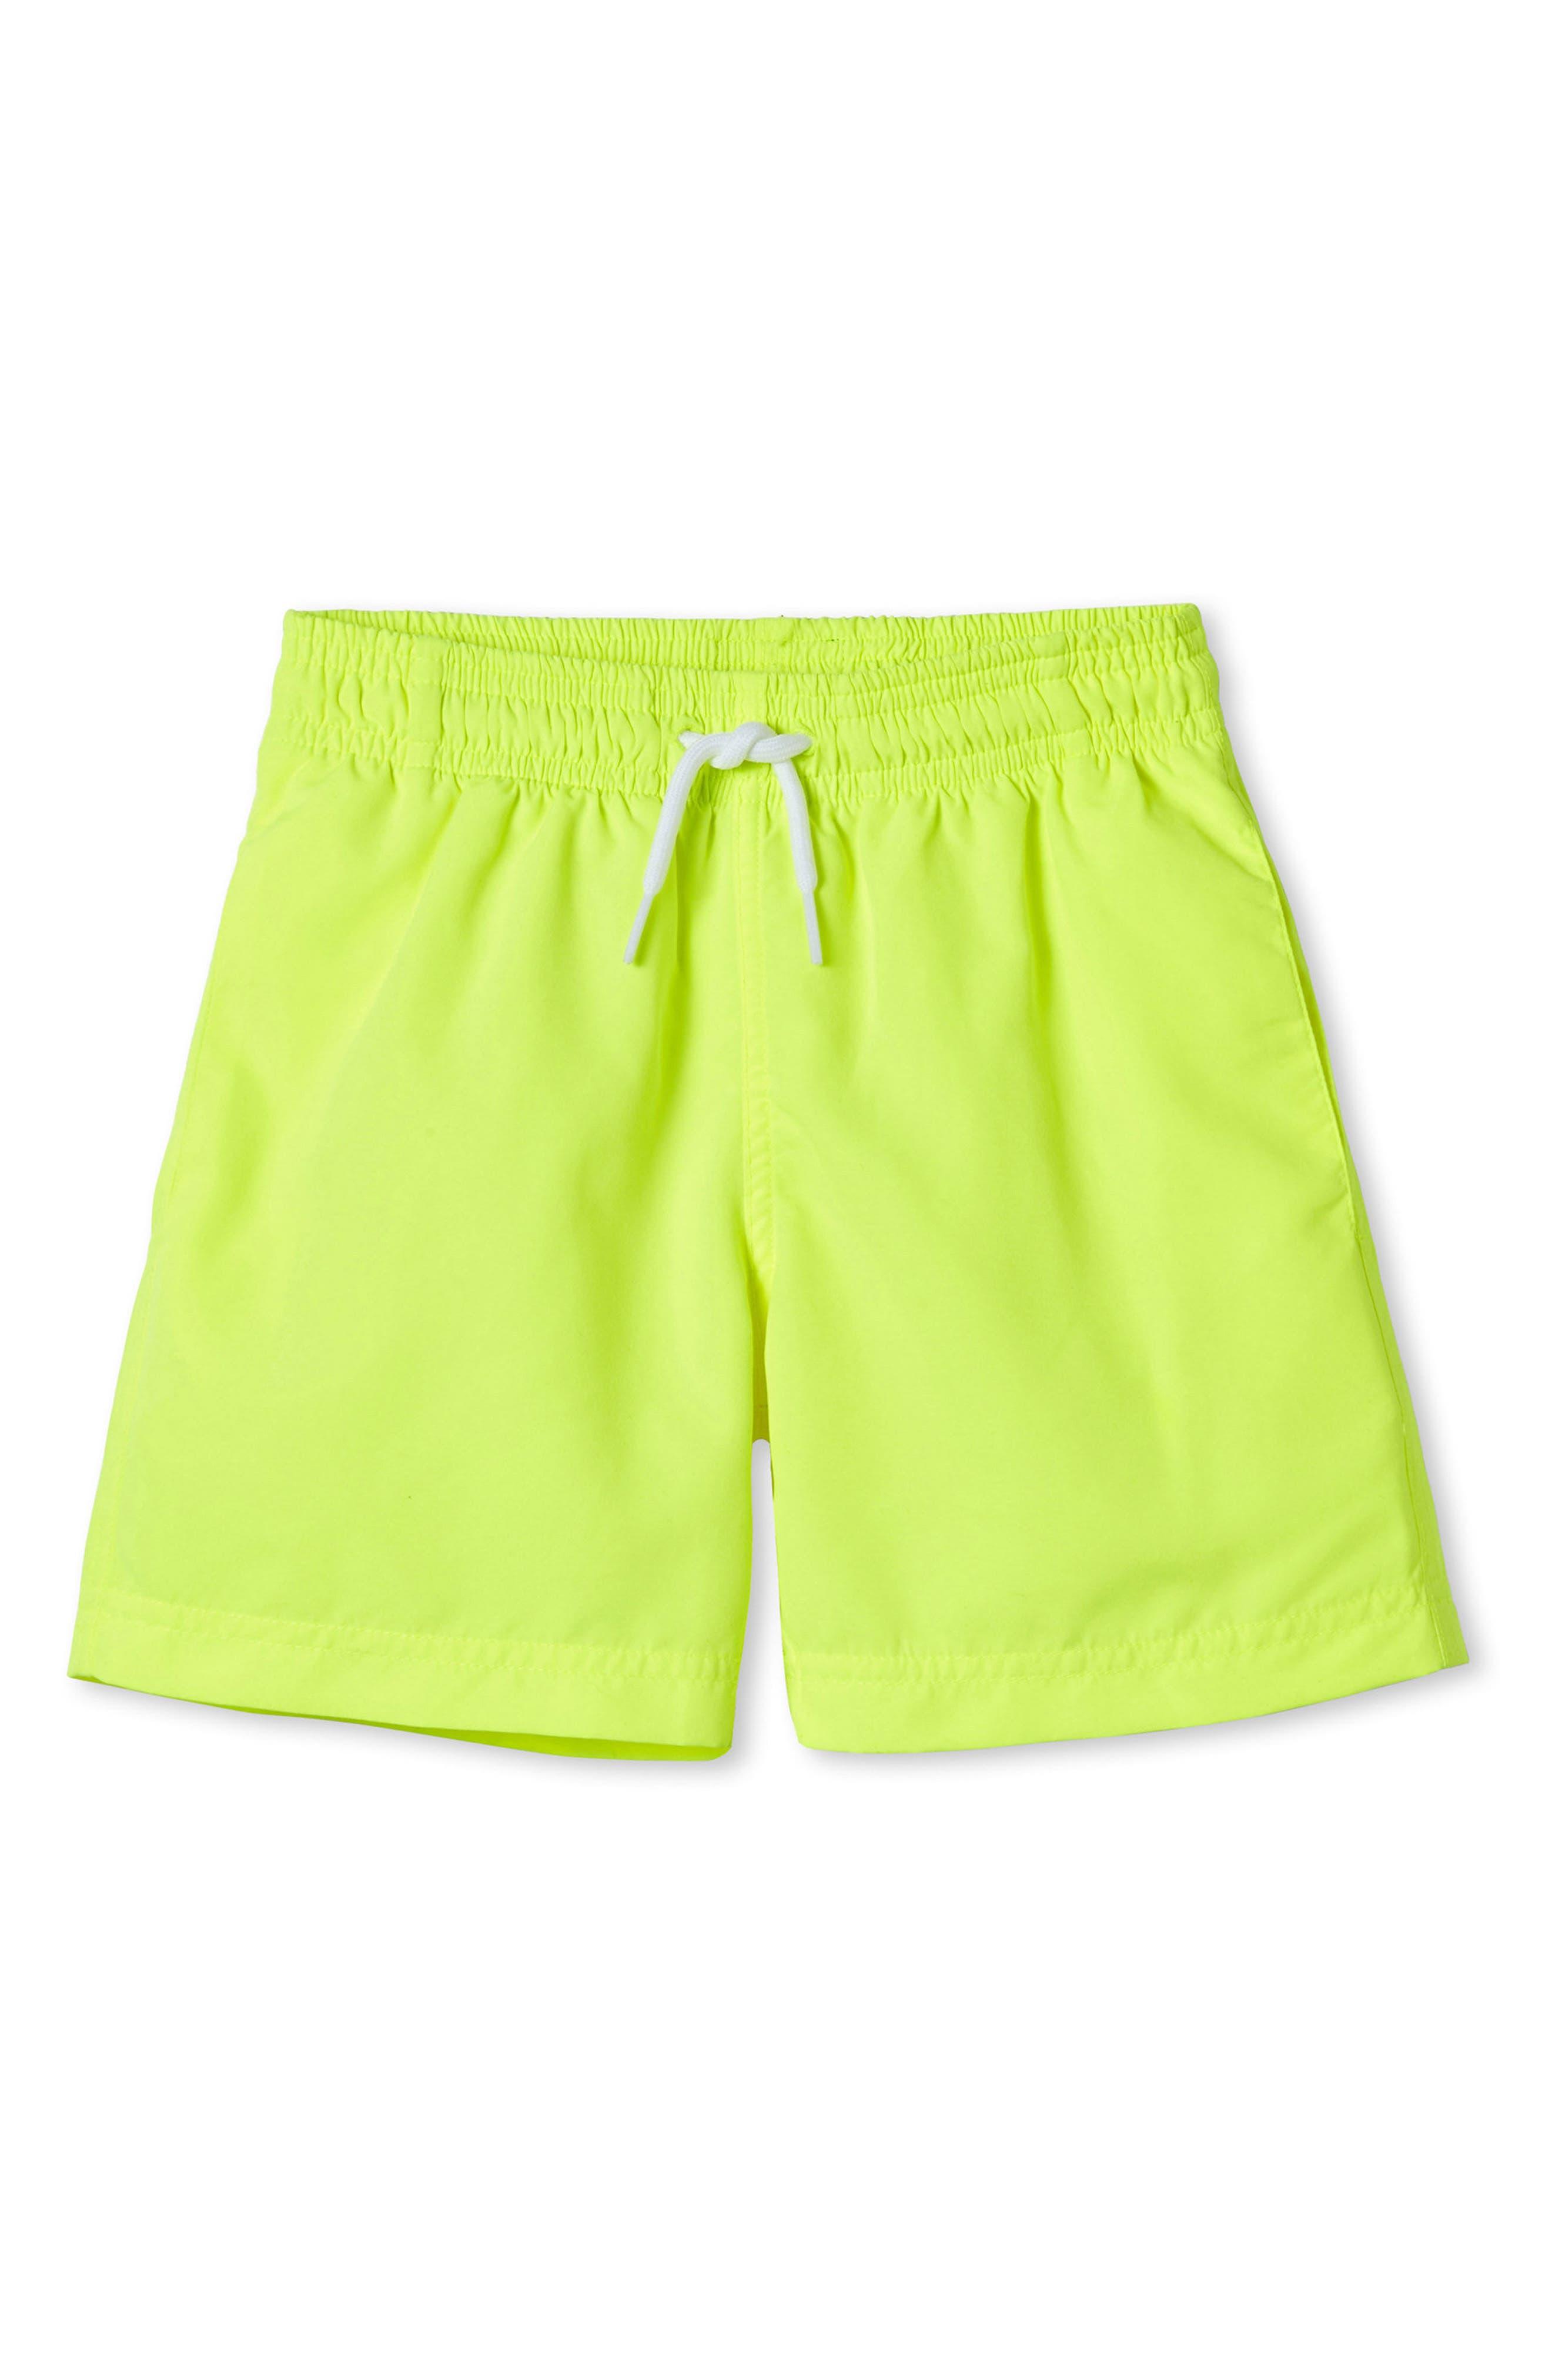 Main Image - Stella Cove Neon Yellow Swim Trunks (Toddler Boys & Little Boys)